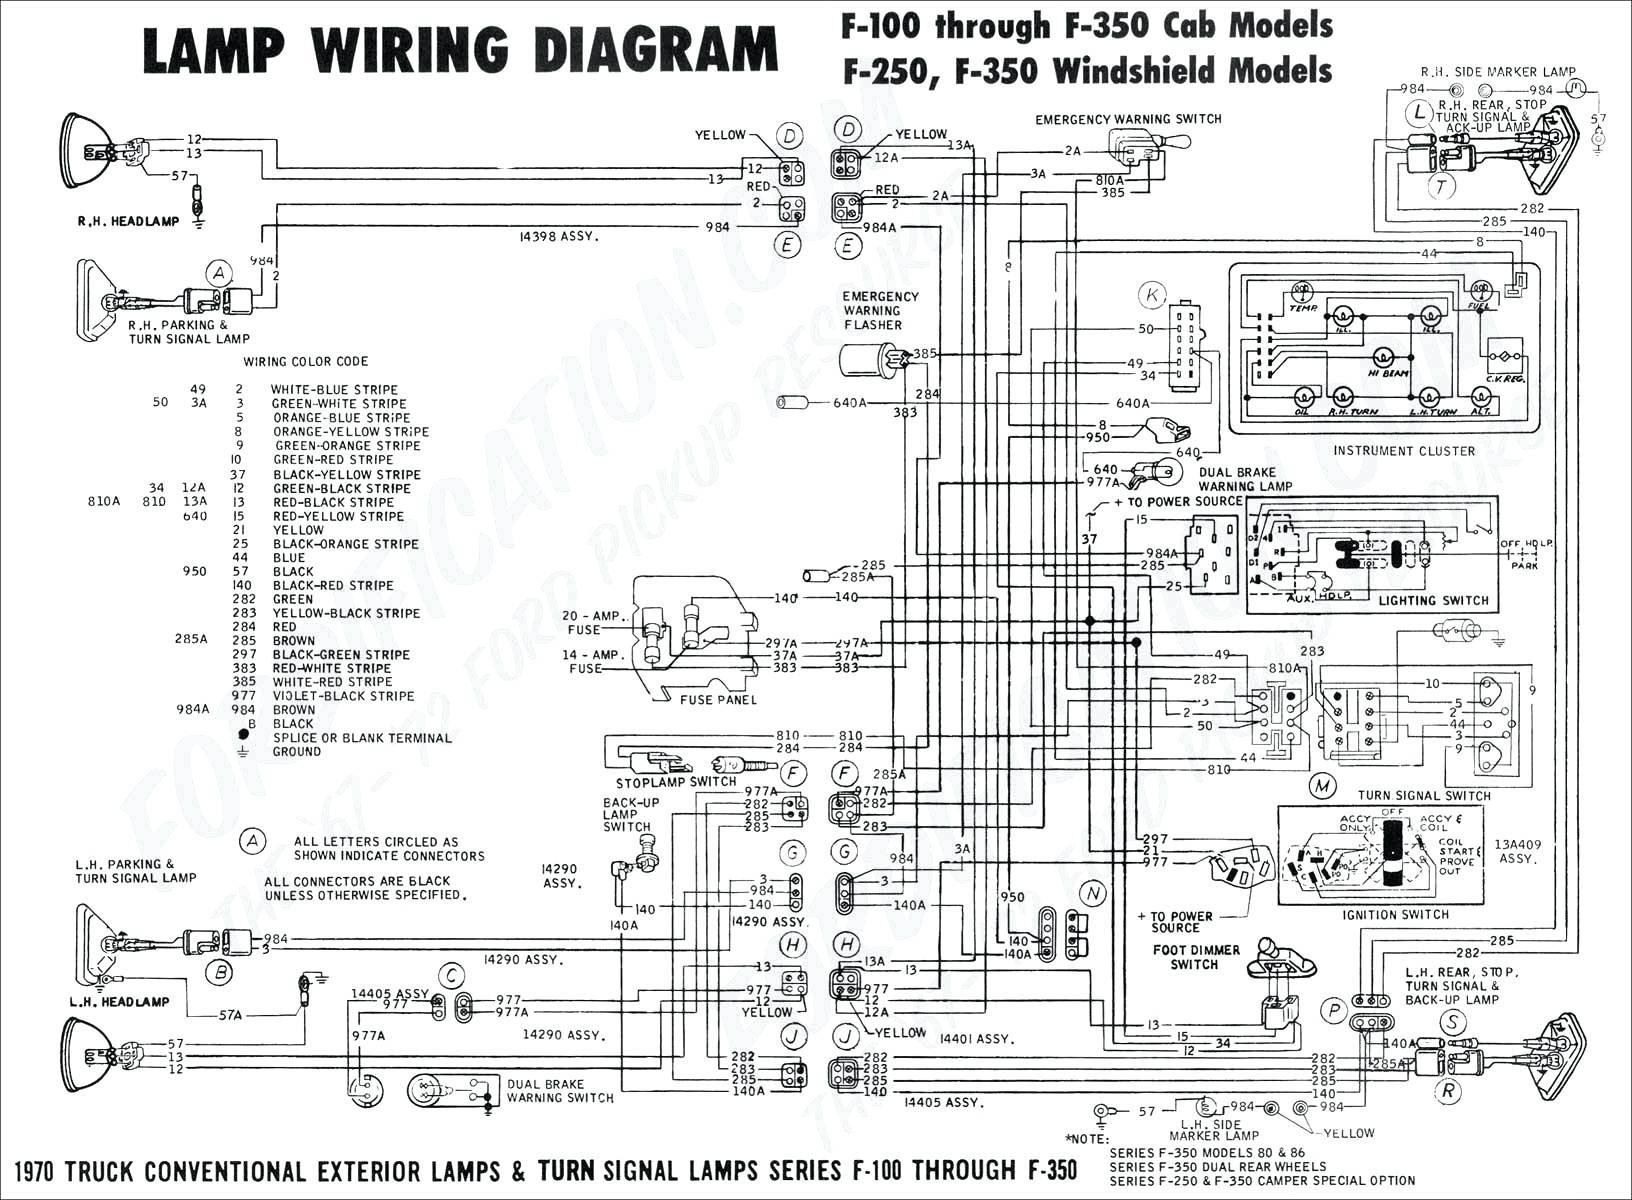 1984 Chevy Truck Wiring Diagram 1981 Chevy Van Wiring Diagram Another Blog About Wiring Diagram • Of 1984 Chevy Truck Wiring Diagram